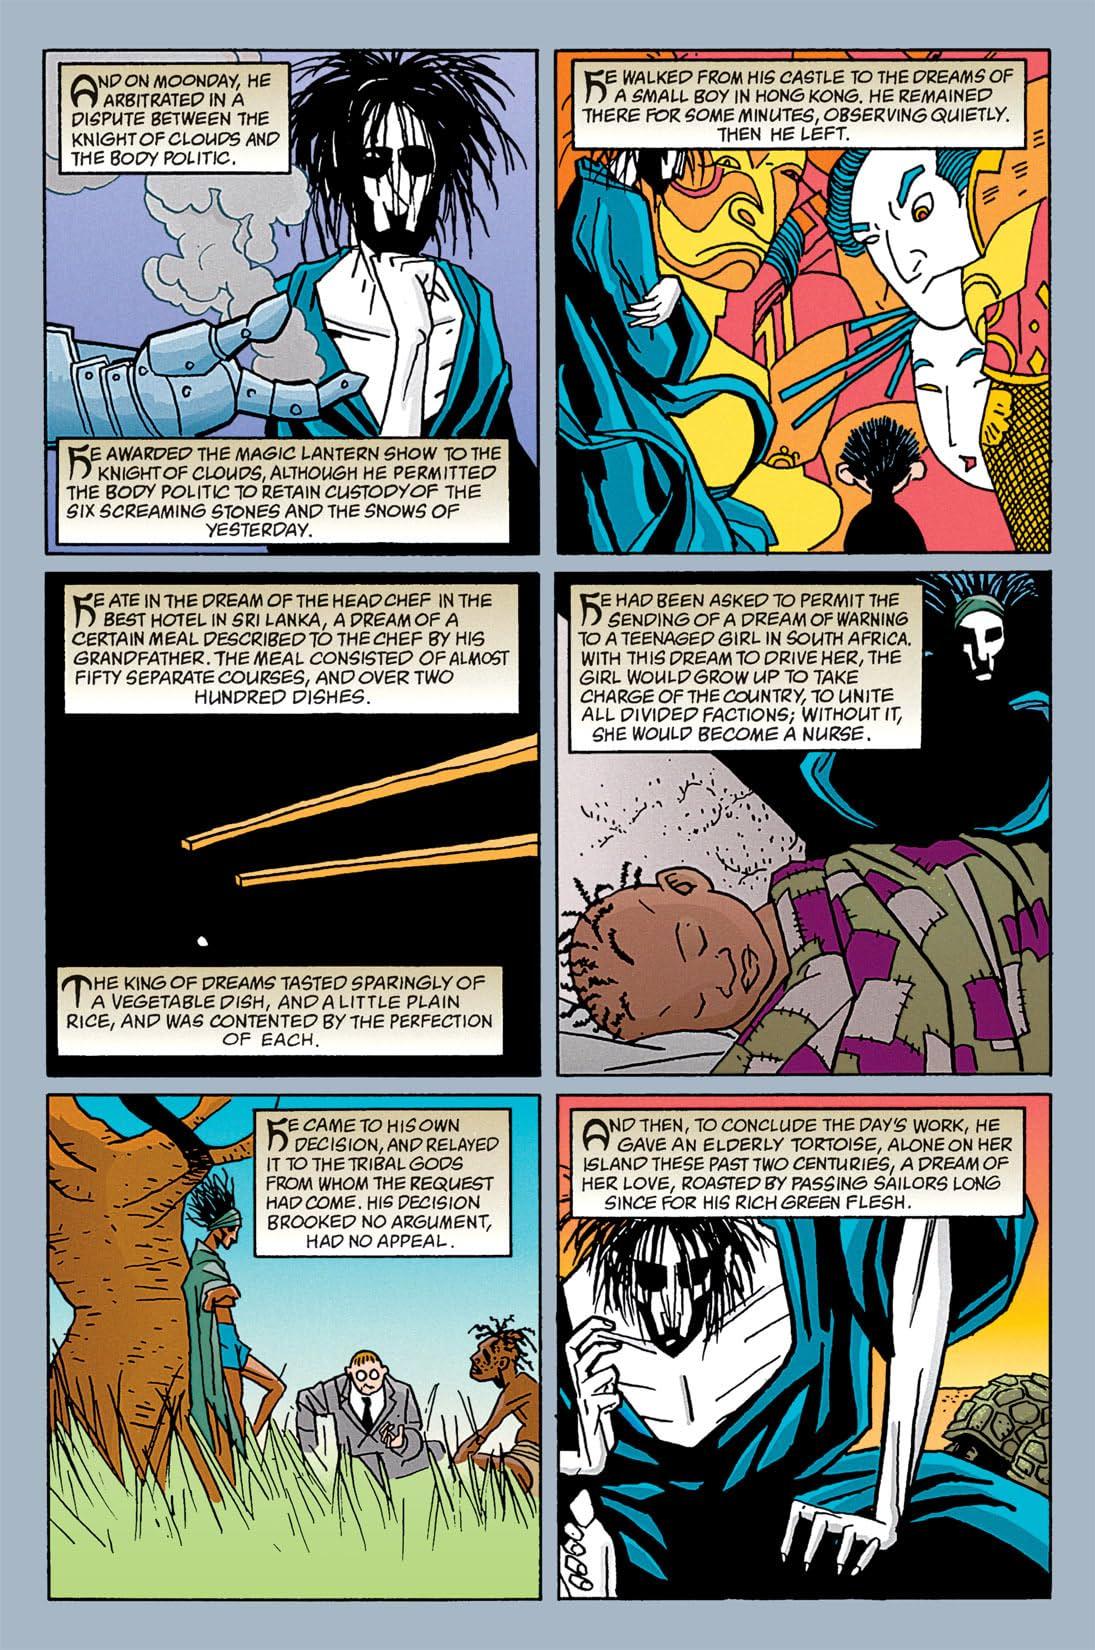 The Sandman #64